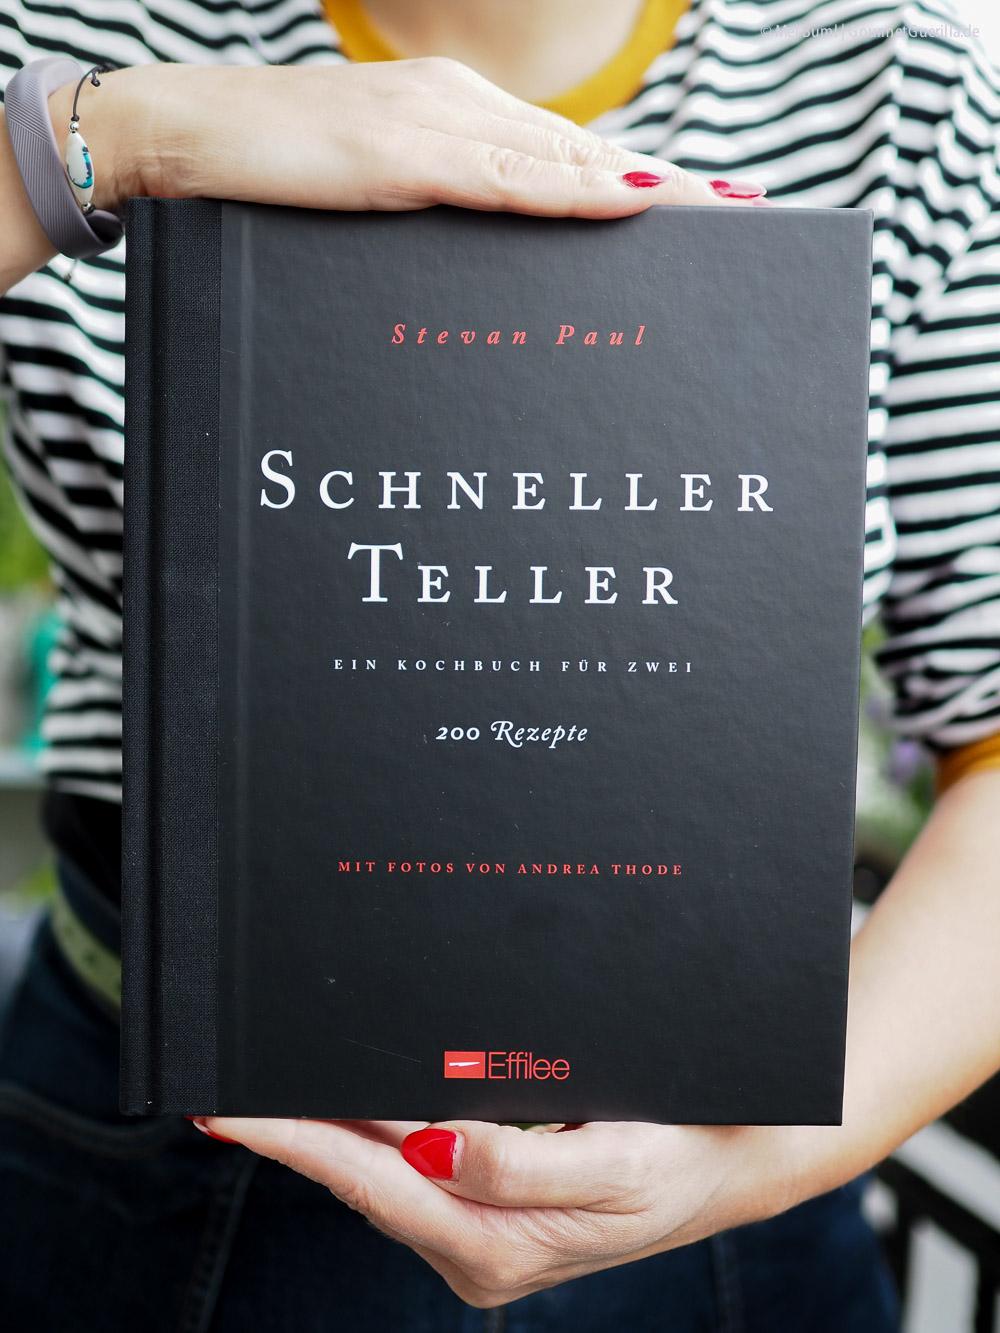 Kochbuch Schneller Teller von Stevan Paul |GourmetGuerilla.de